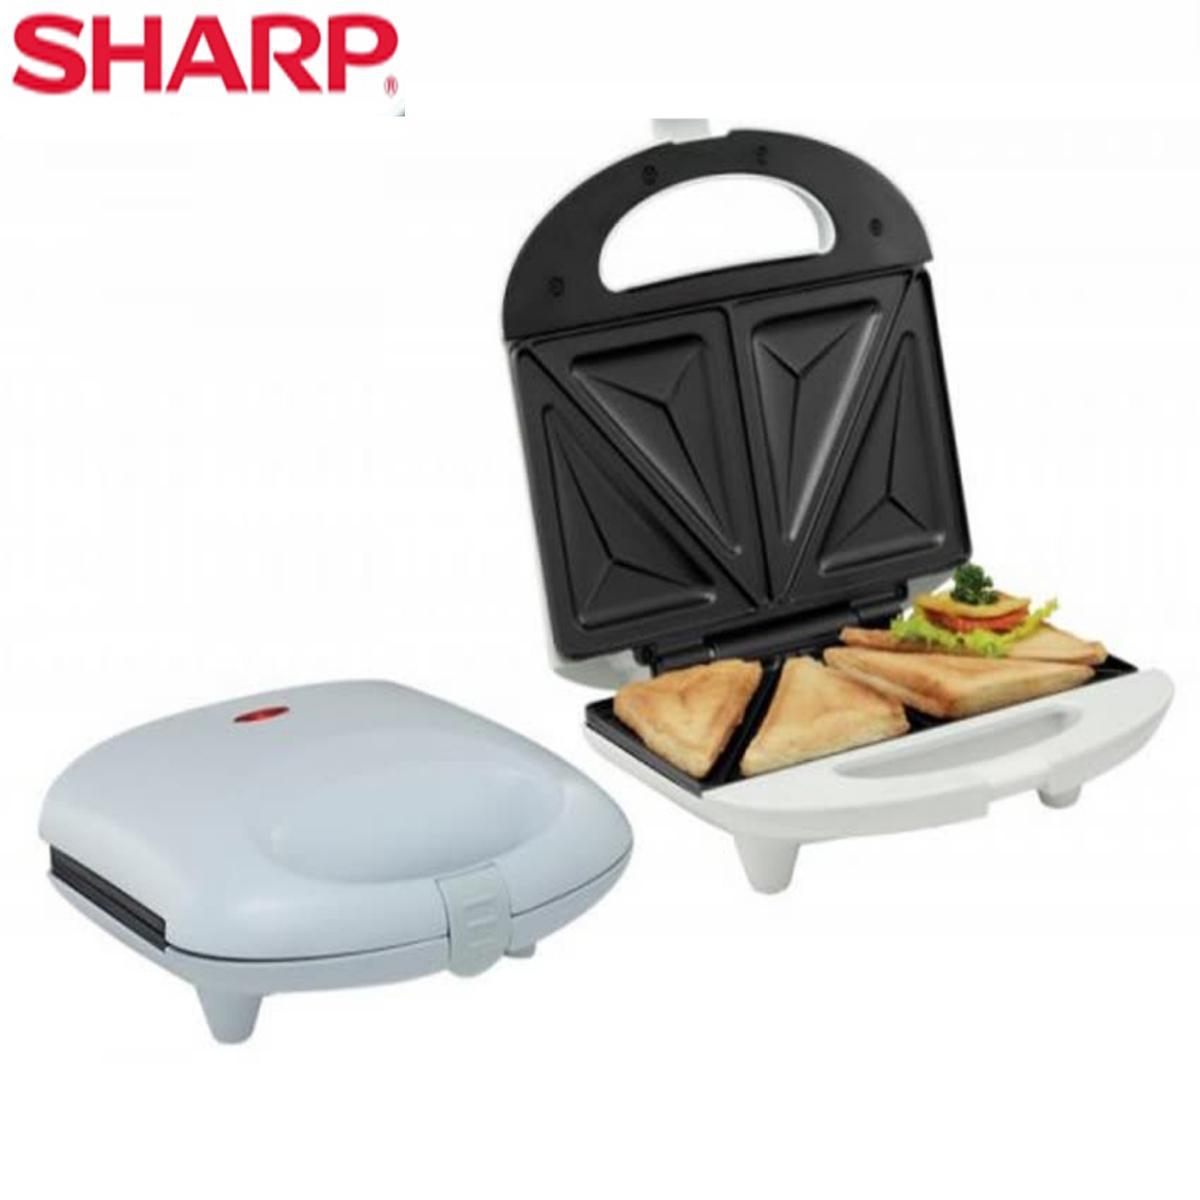 Sharp Sandwich Toaster Kzs - 70 L(w) Garansi Resmi By Java Elektronik.